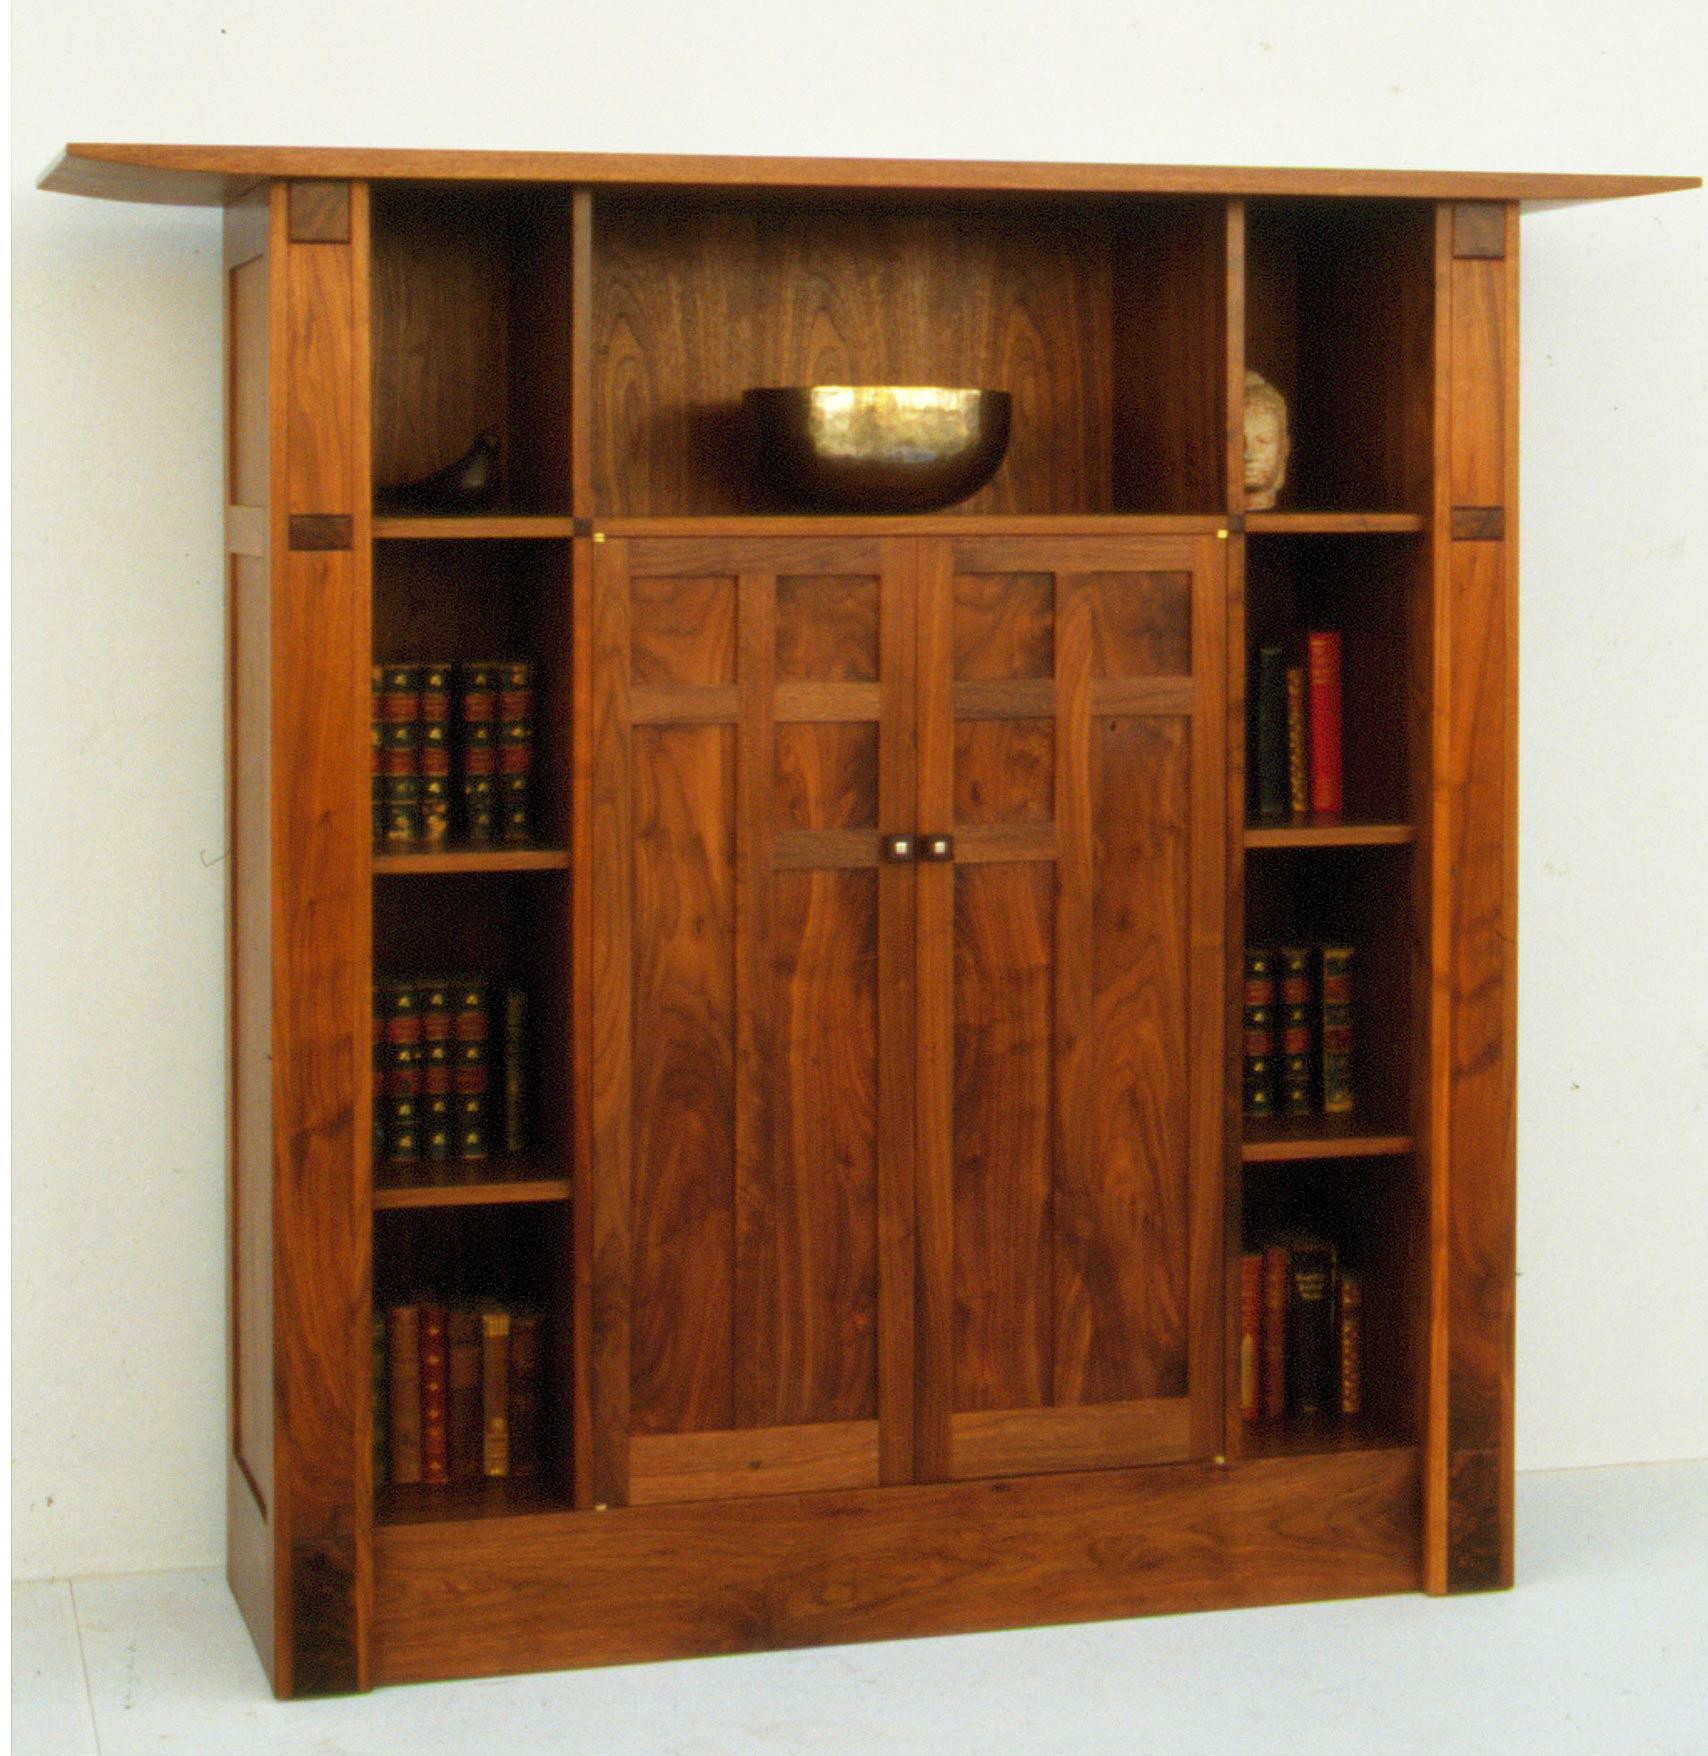 Bespoke Bookcase In English Walnut